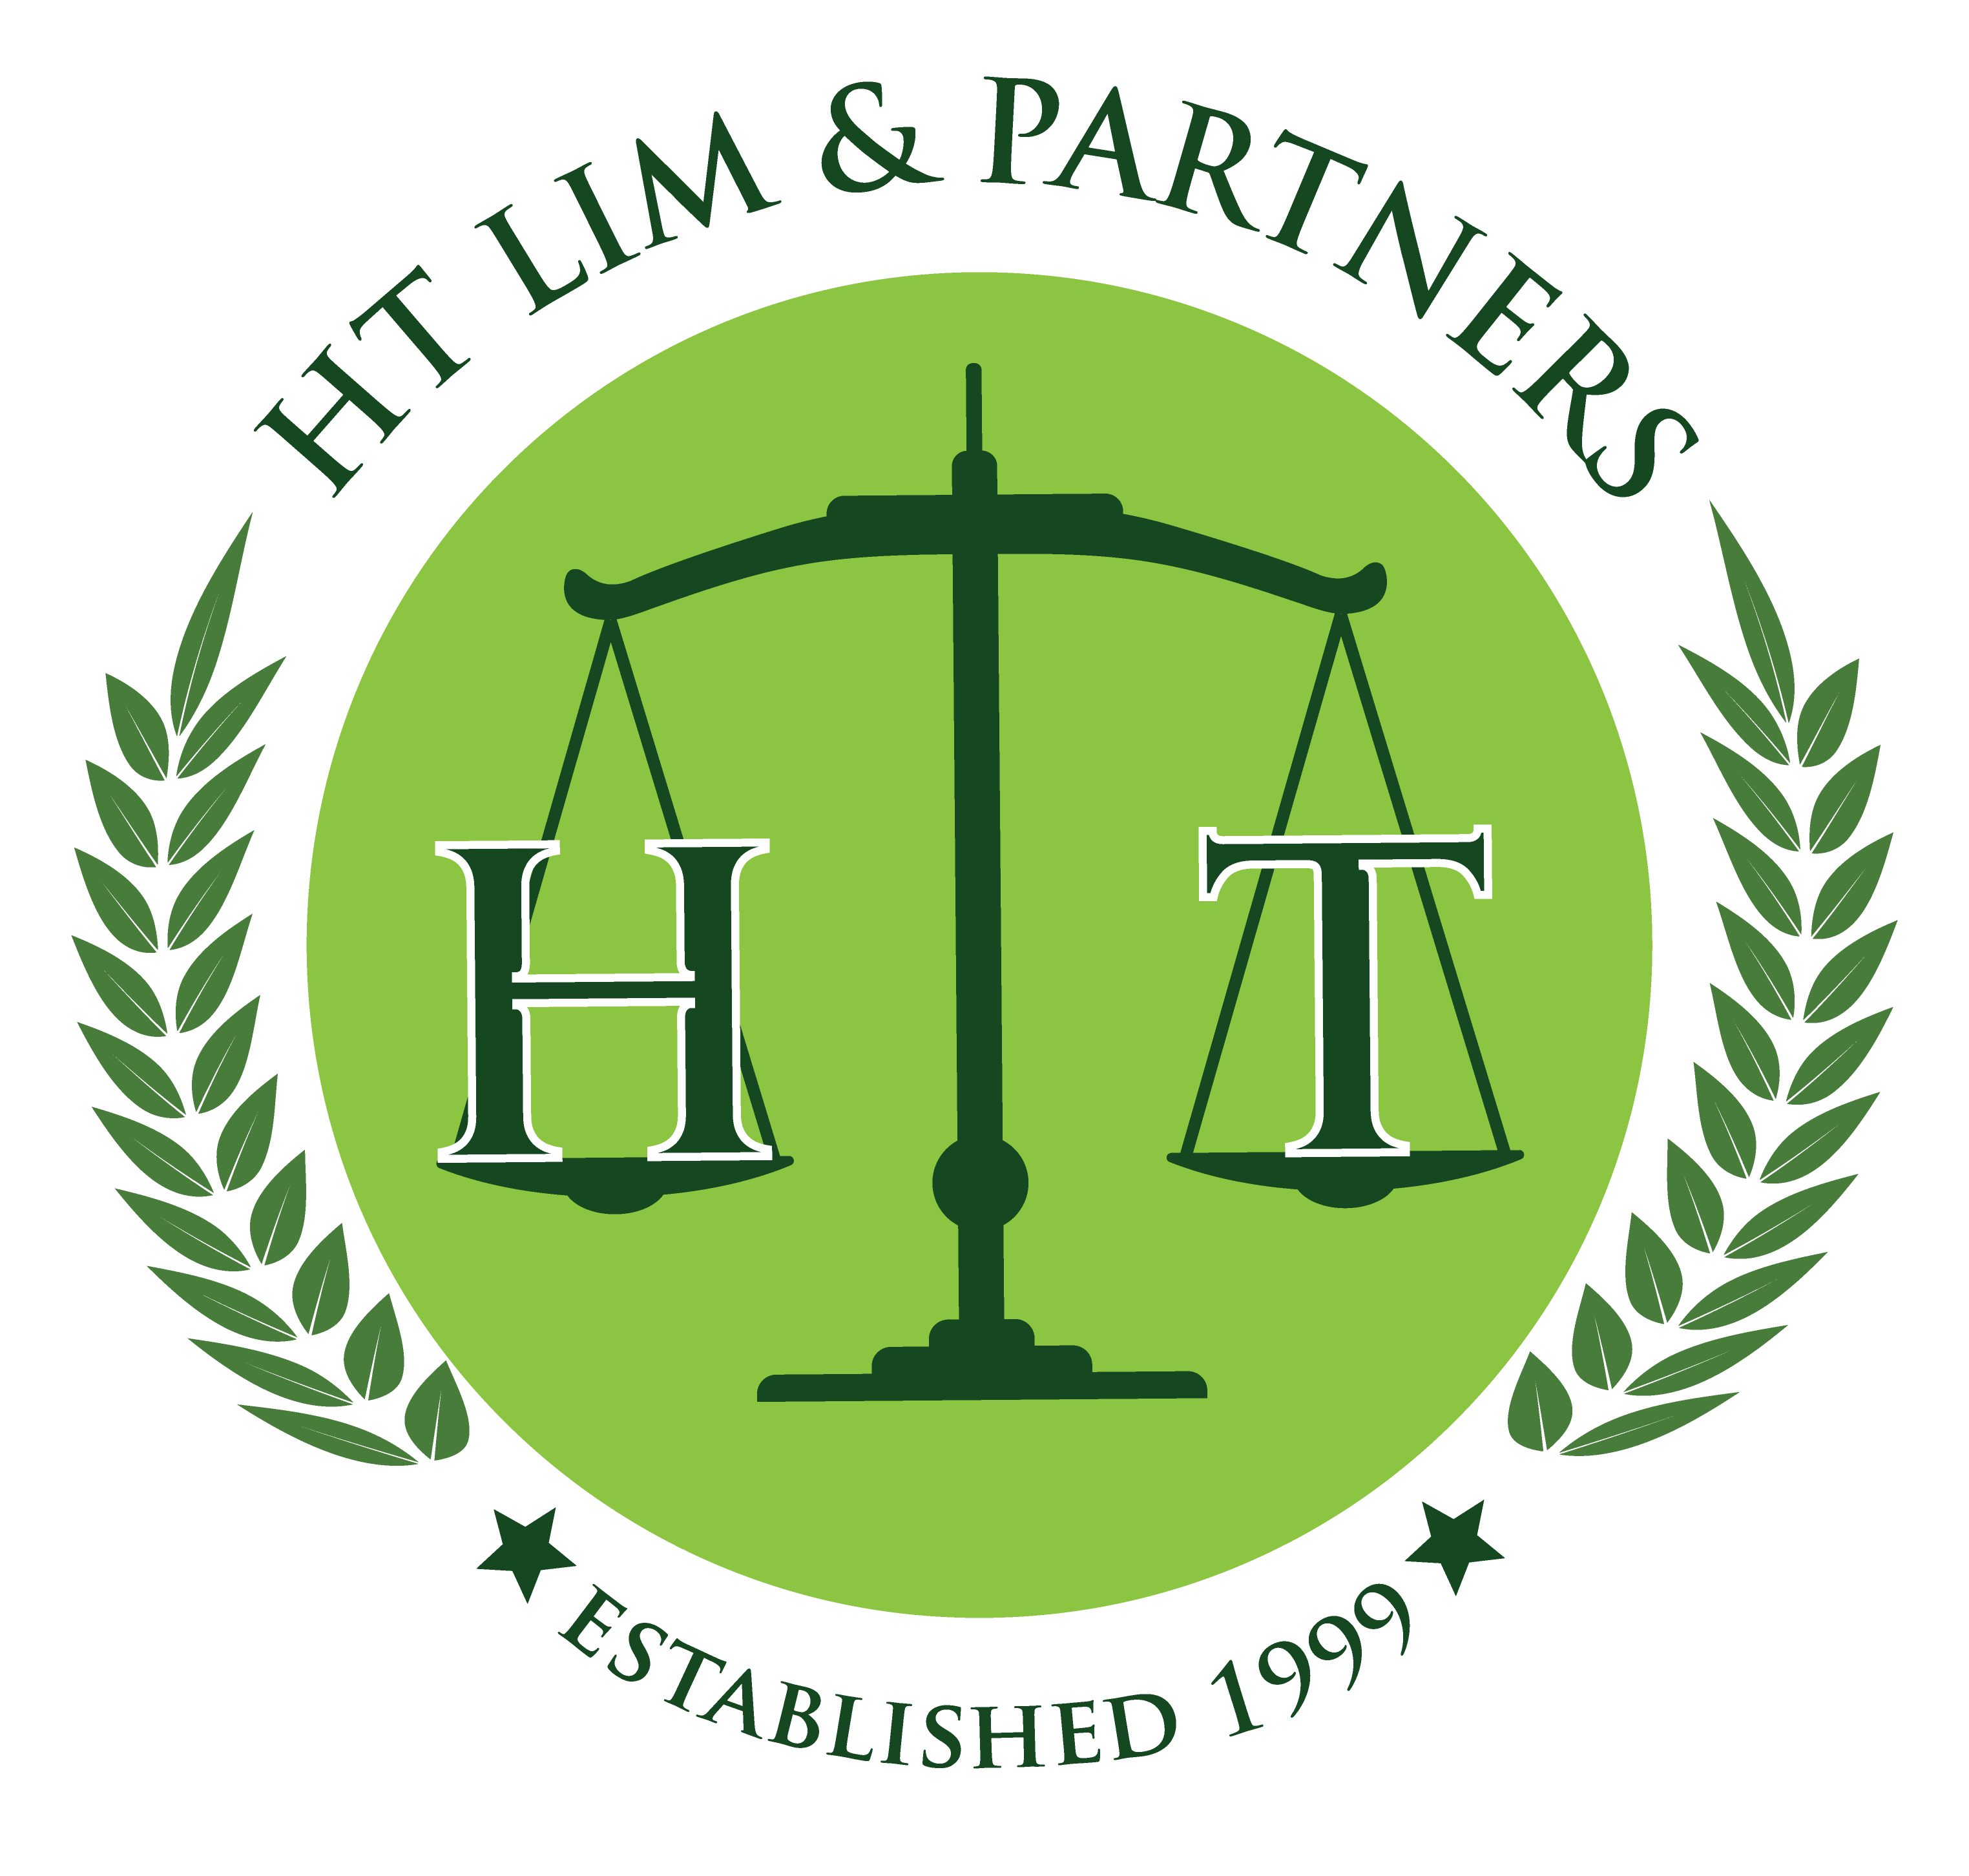 H T LIM & PARTNERS